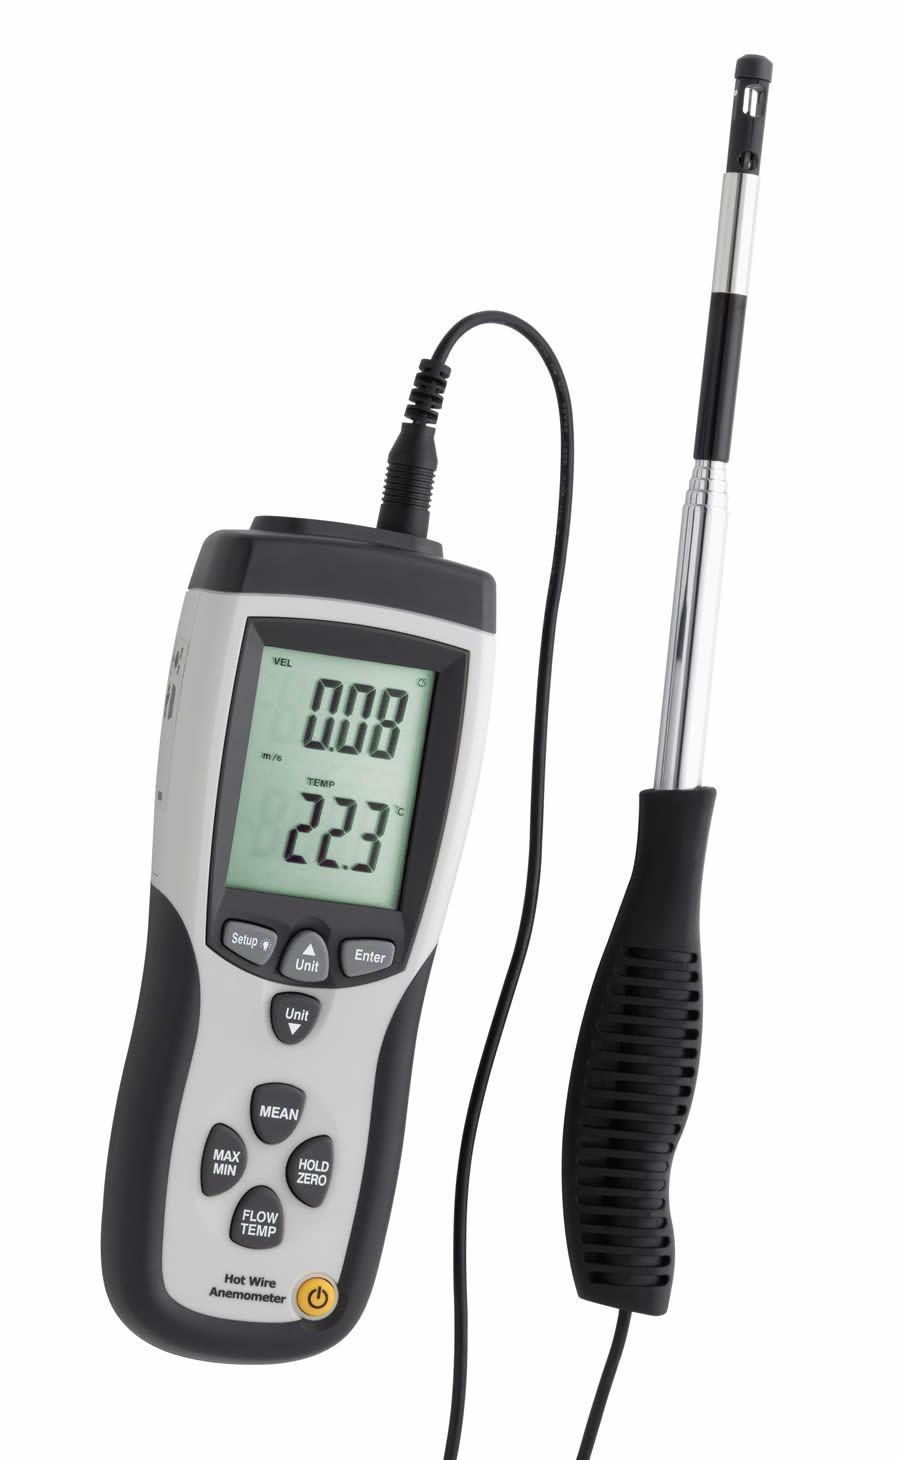 Leak detector, manometer, anemometer, thermometer, IR thermo ...